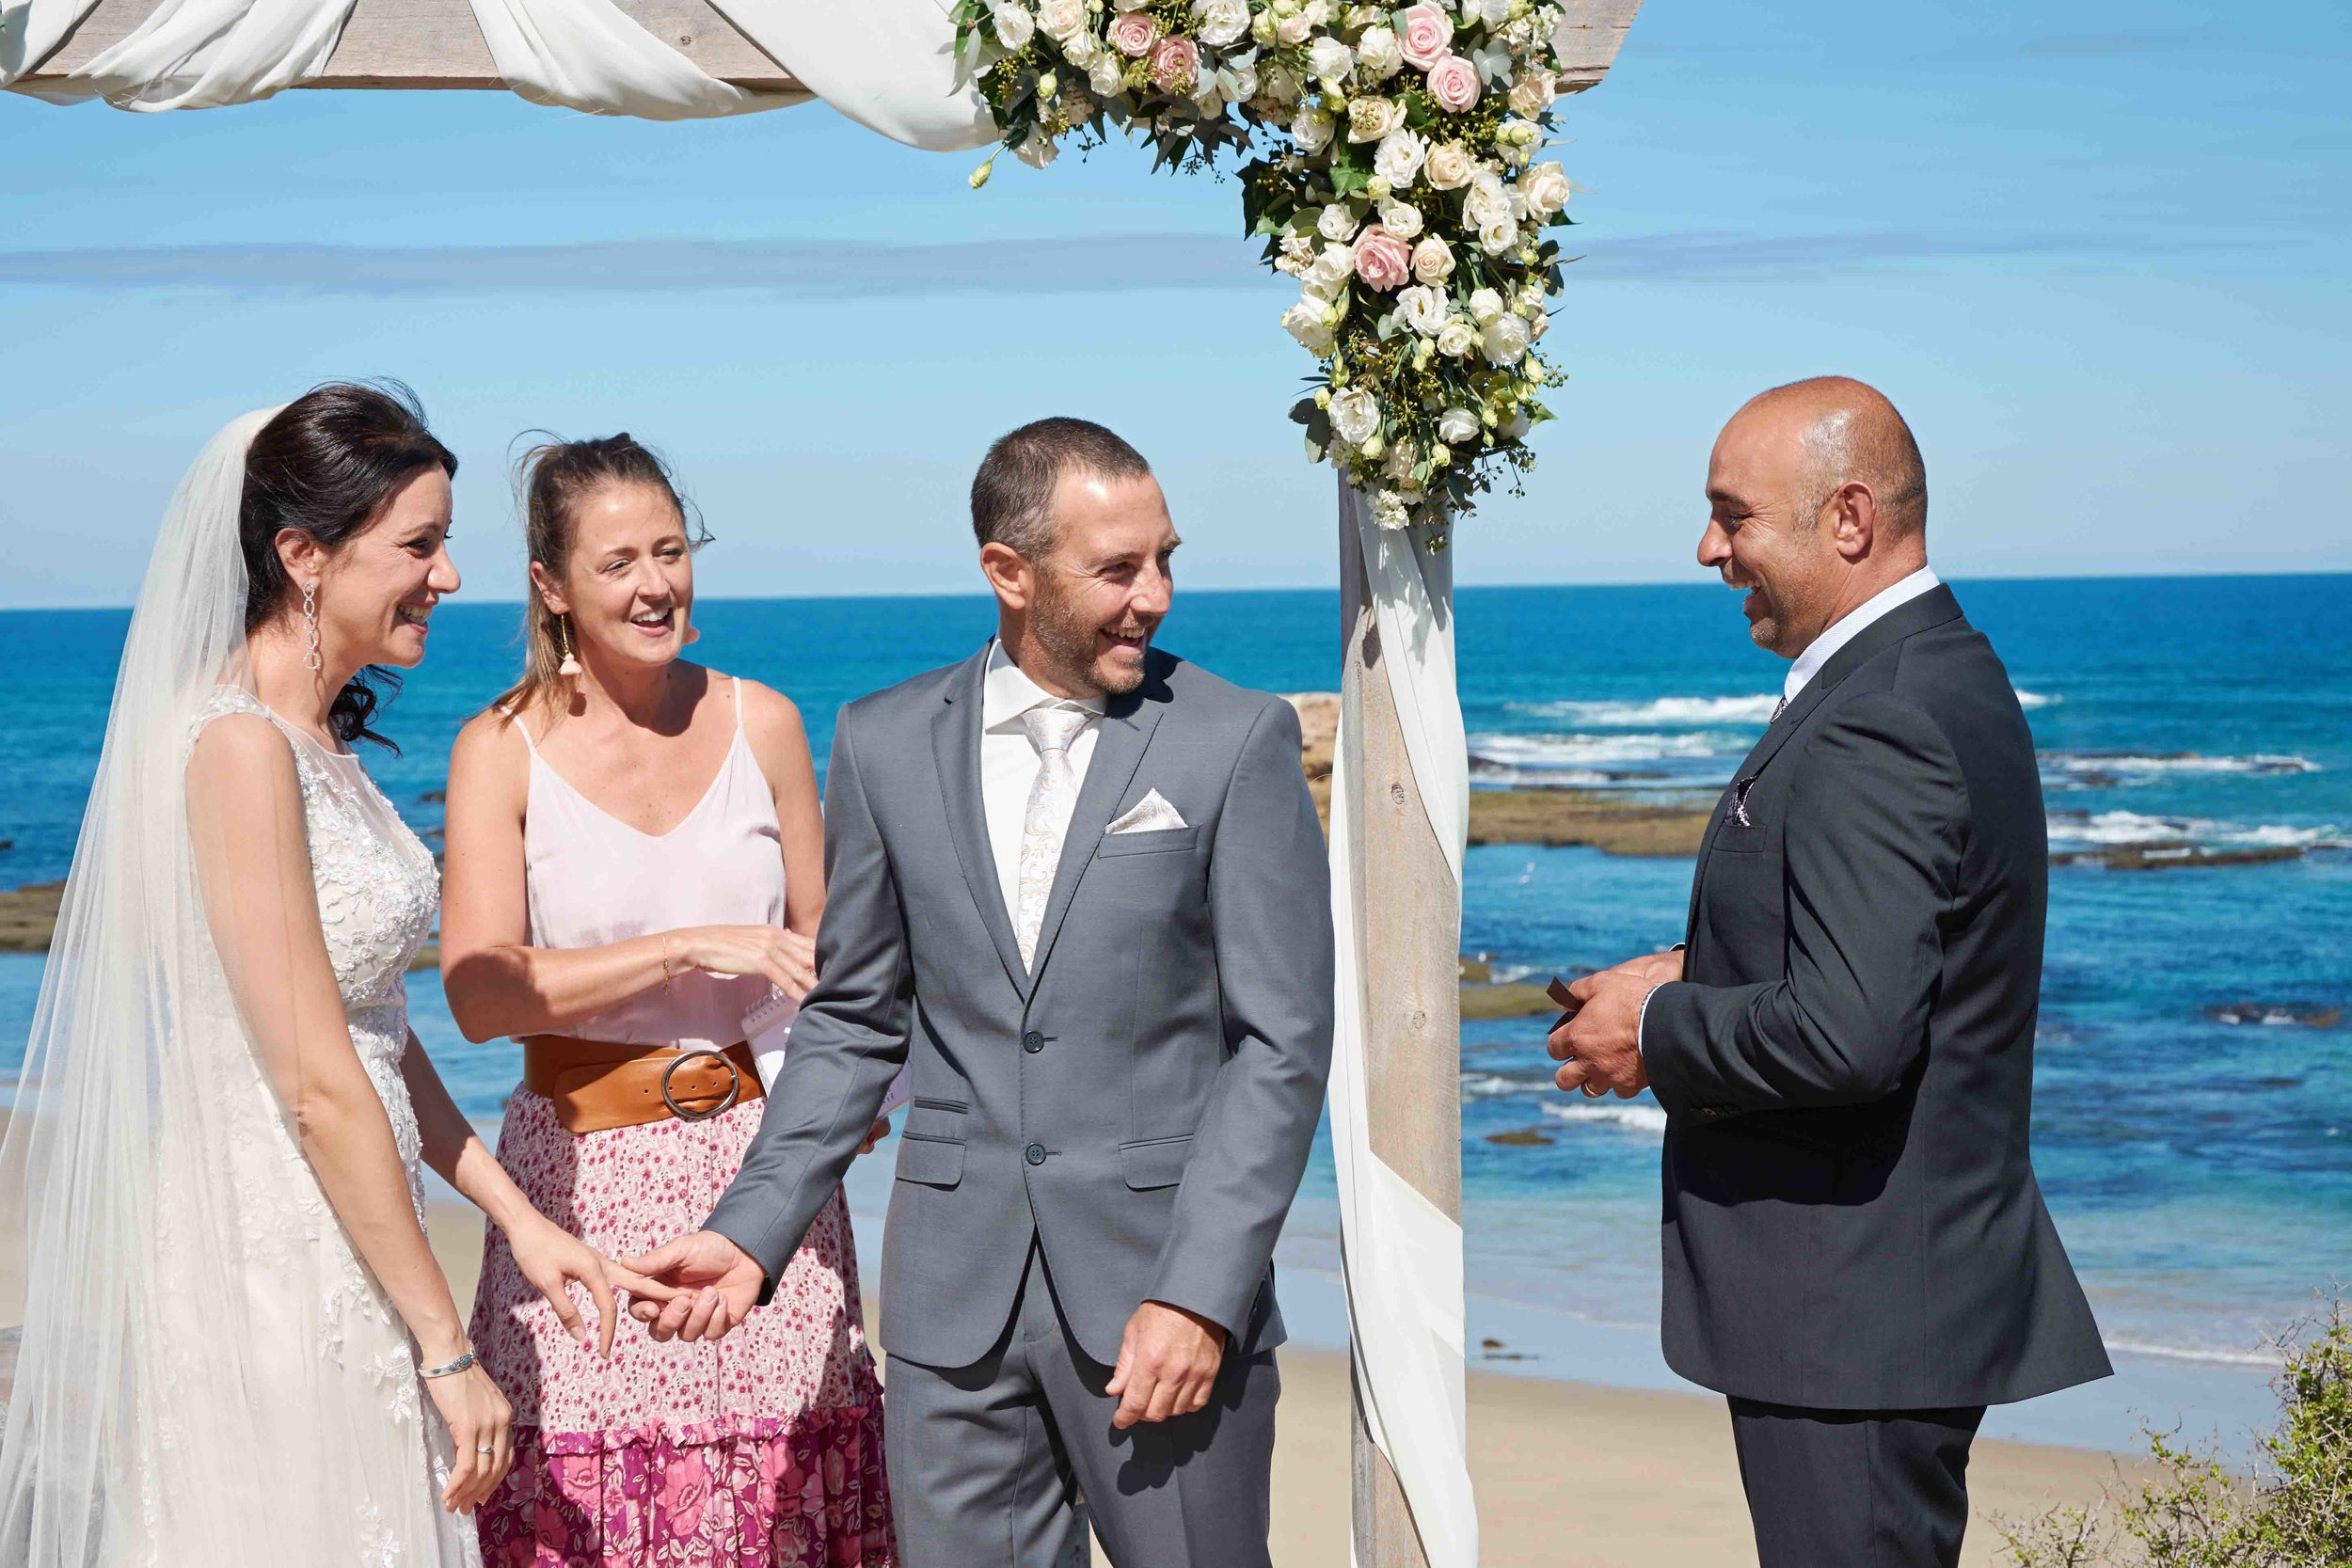 sorrento-wedding-photography-all-smiles-marissa-jade-photography-52.jpg